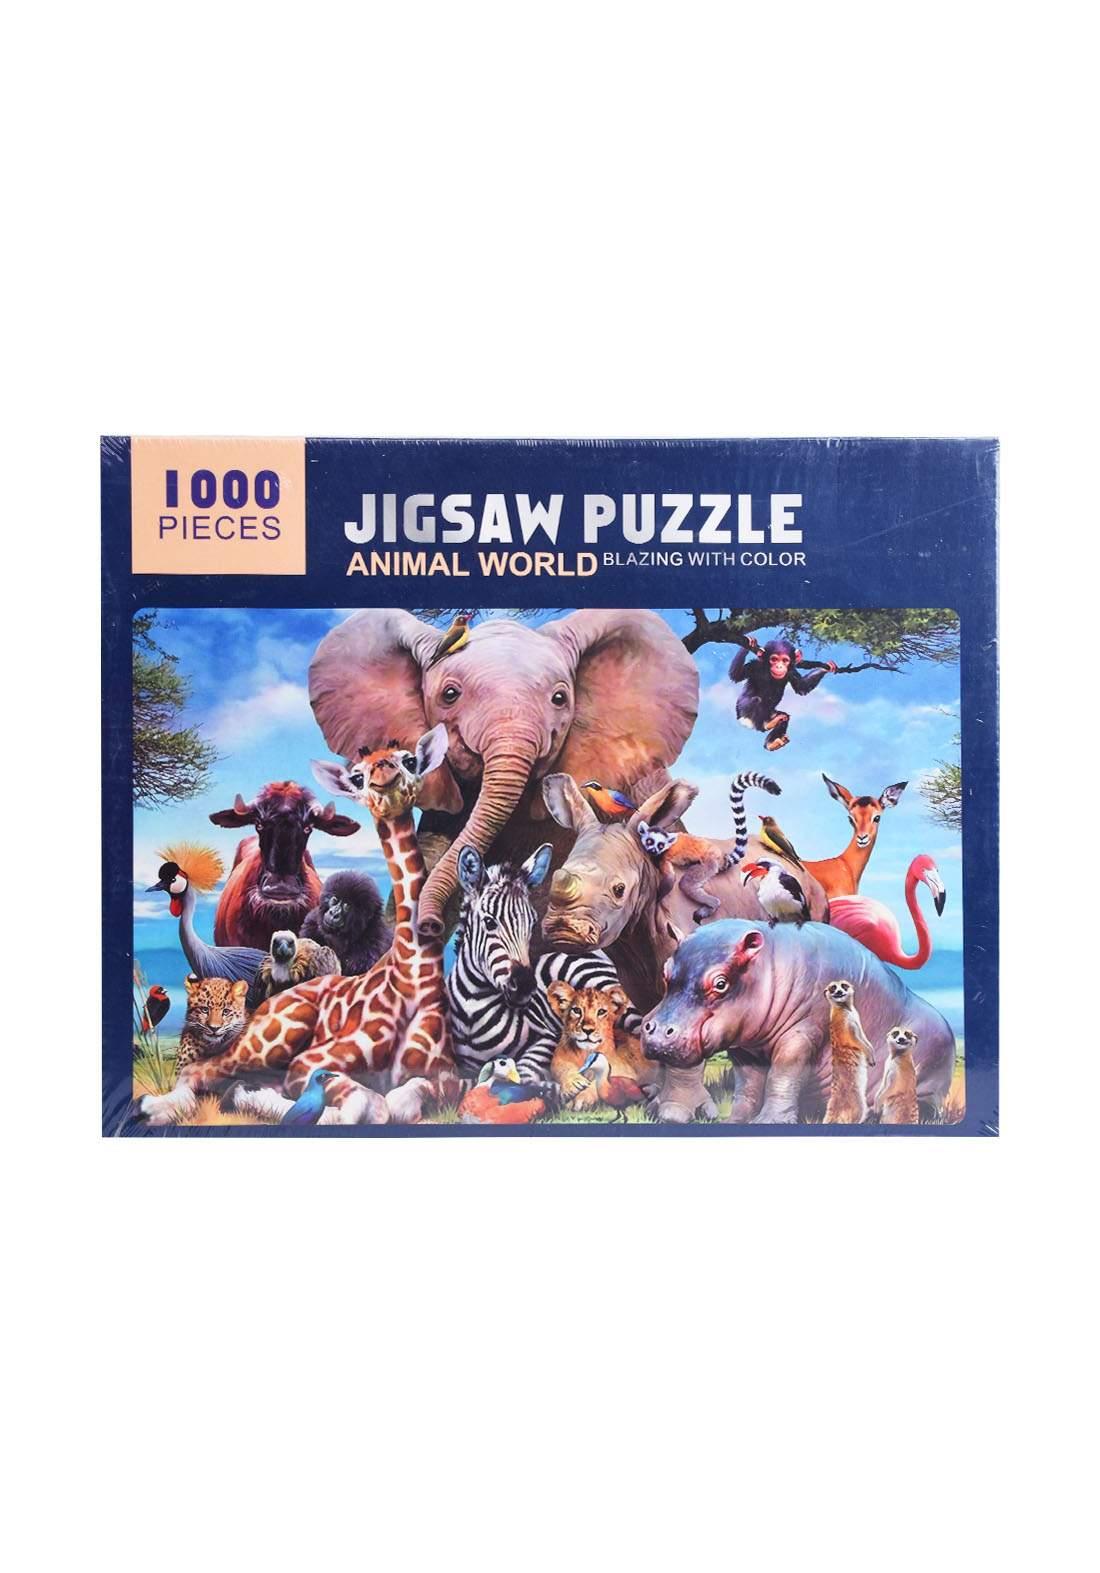 Jigsaw Puzzle Animal World 1000Pcs لعبة تركيب القطع بشكل عالم الحيوان